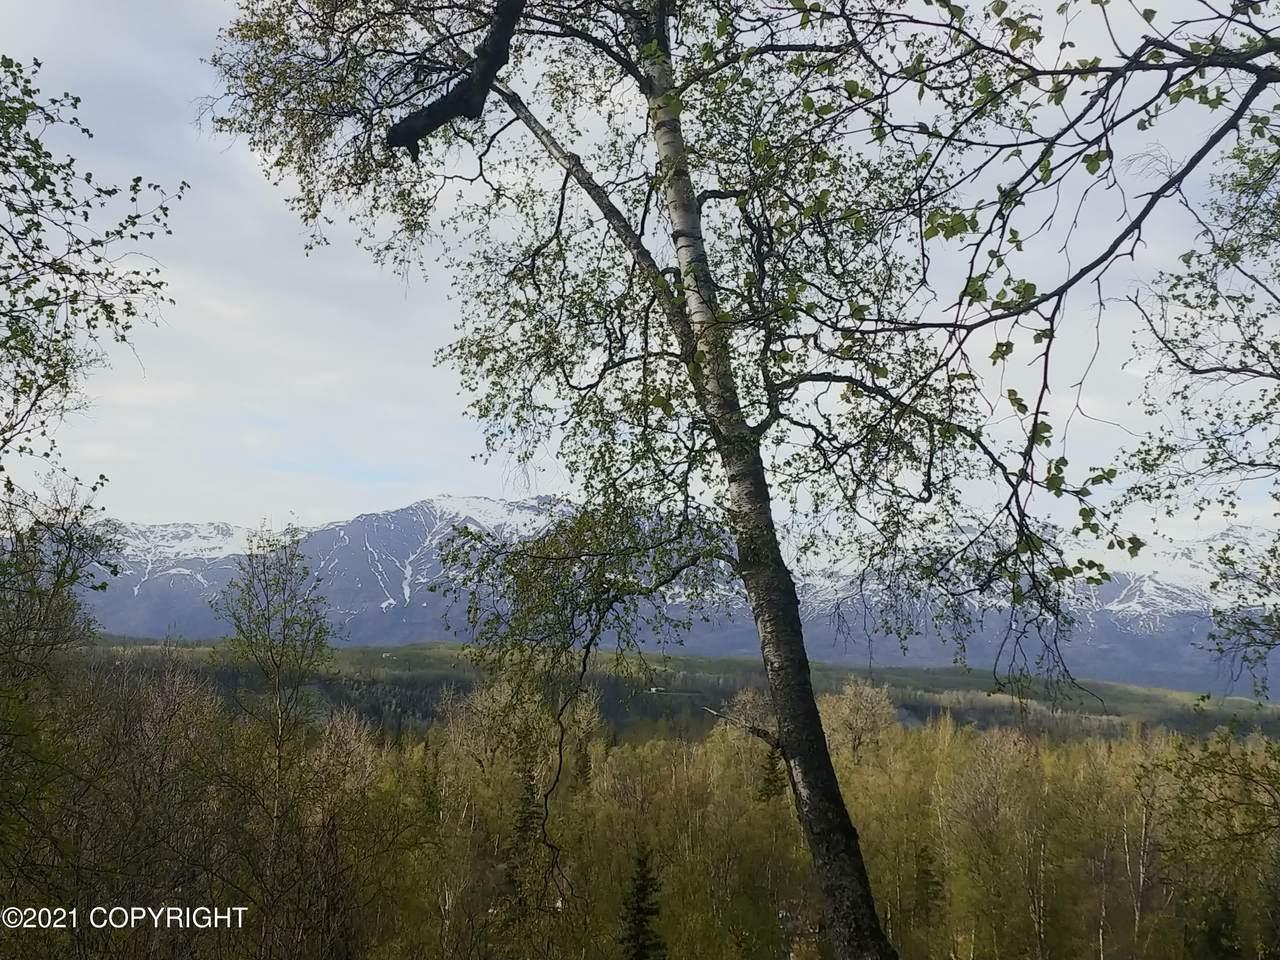 https://bt-photos.global.ssl.fastly.net/alaska/1280_boomver_3_21-8333-2.jpg